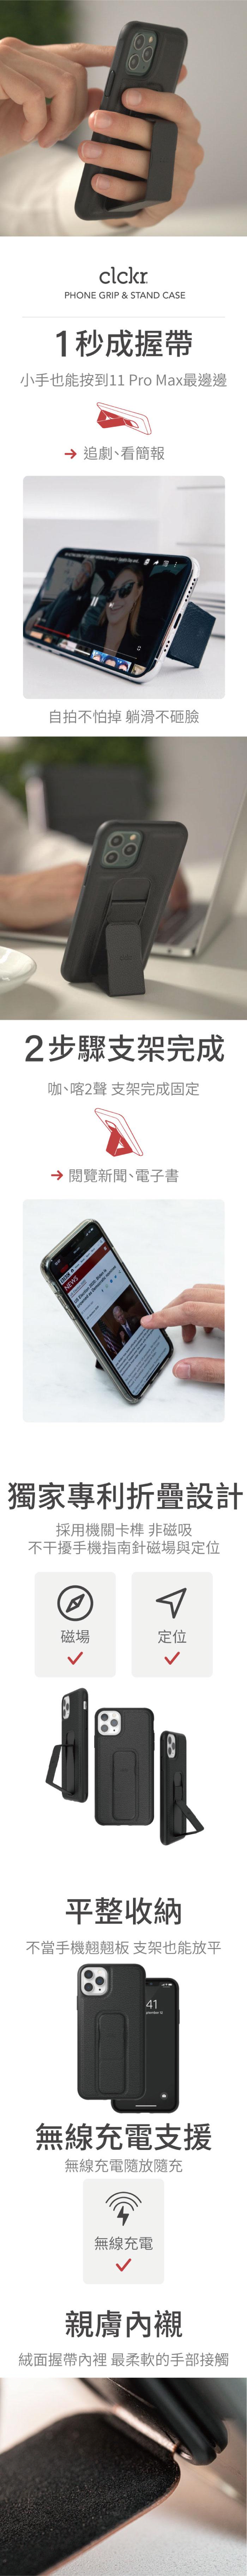 CLCKR|iPhone 11 手機殼 全黑支架款